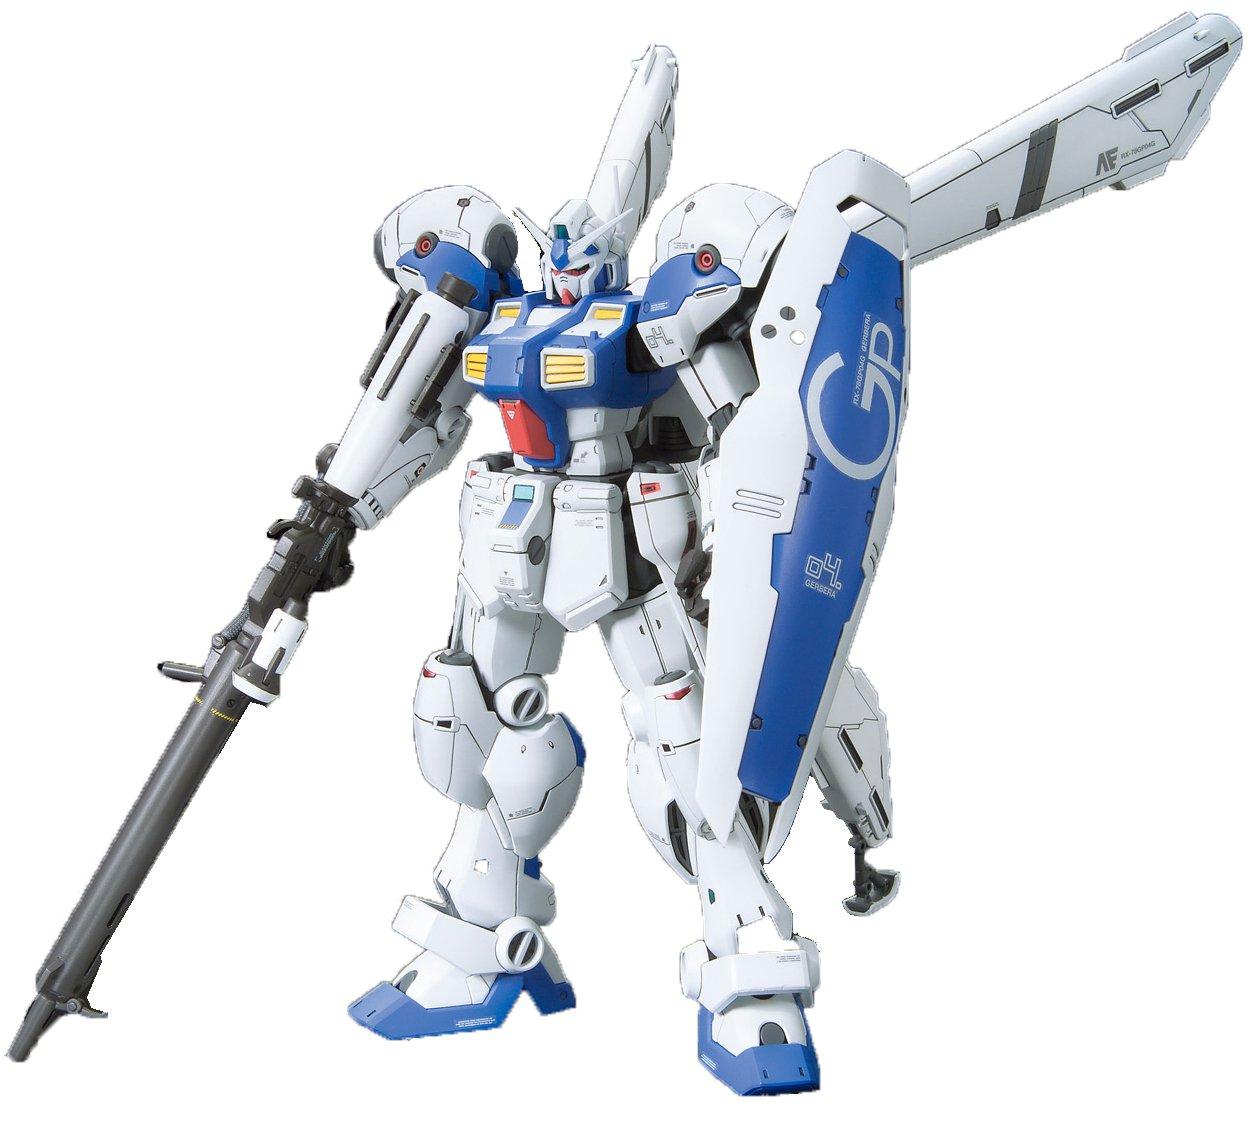 Bandai Hobby Reborn-One Hundert 1/100-scale Gerbera Gundam 0083 Stardust Action Memory Action Stardust Figur b31706